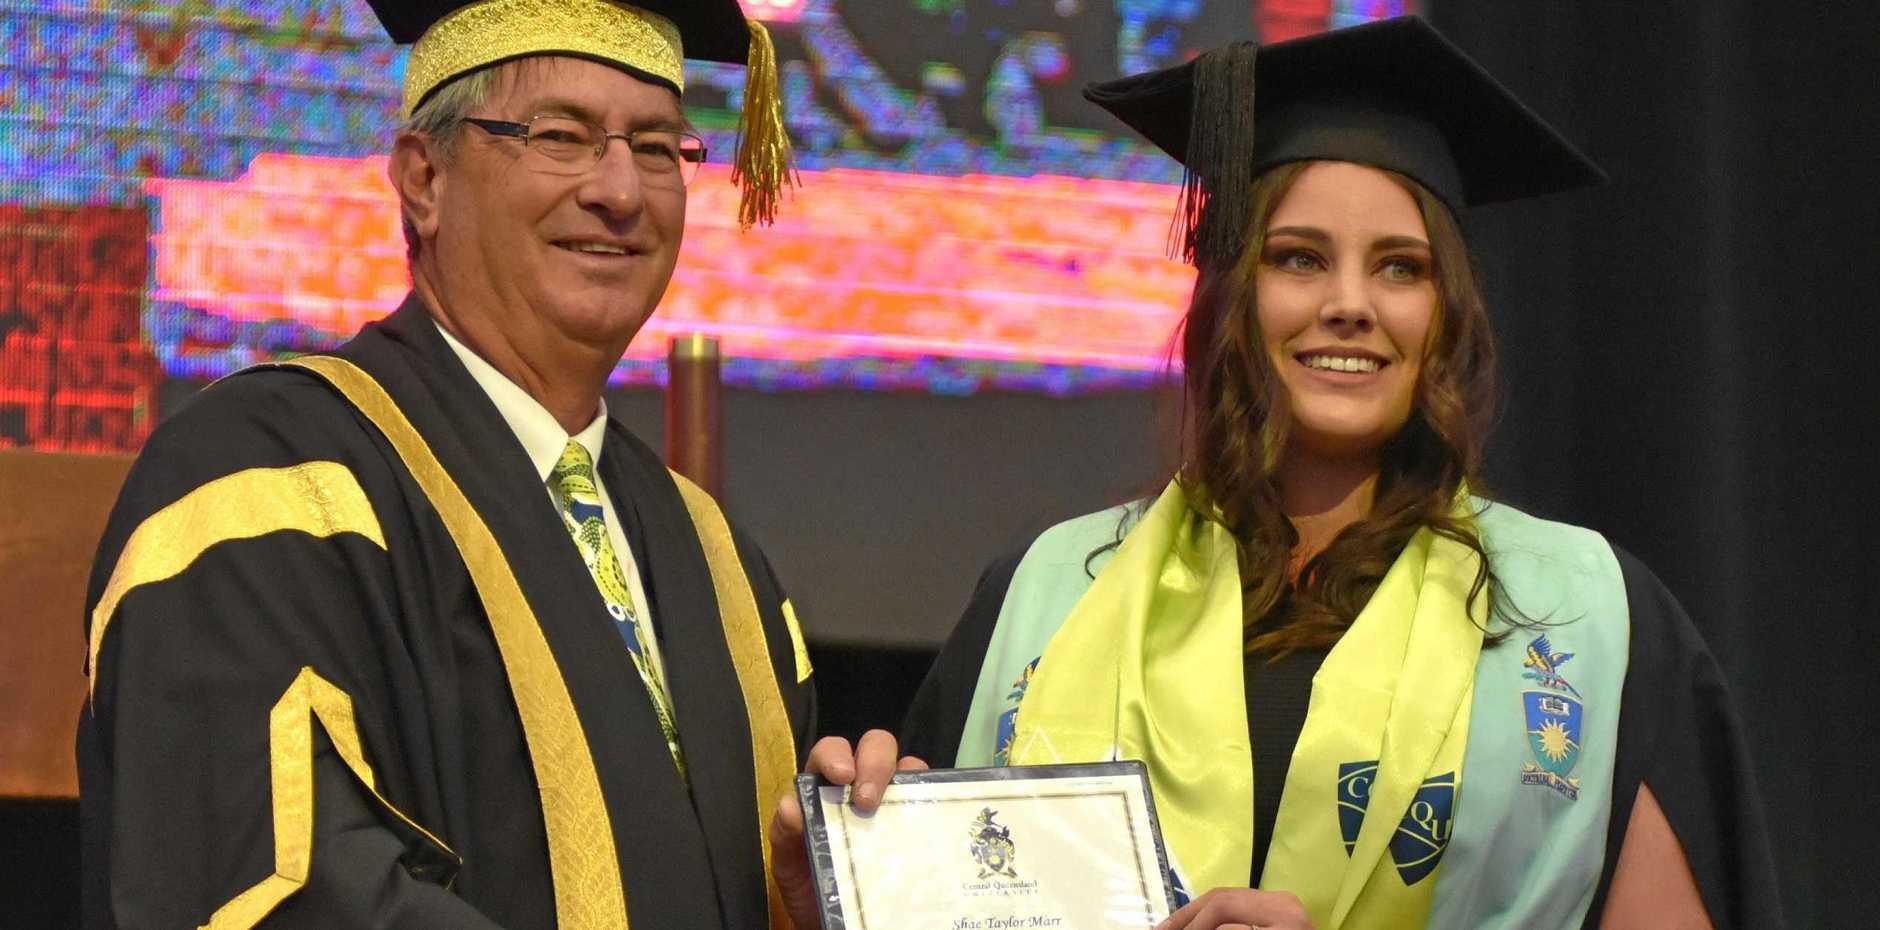 PROUD RESULT: CQUniversity Chancellor John Abbott with graduate Shae Marr.